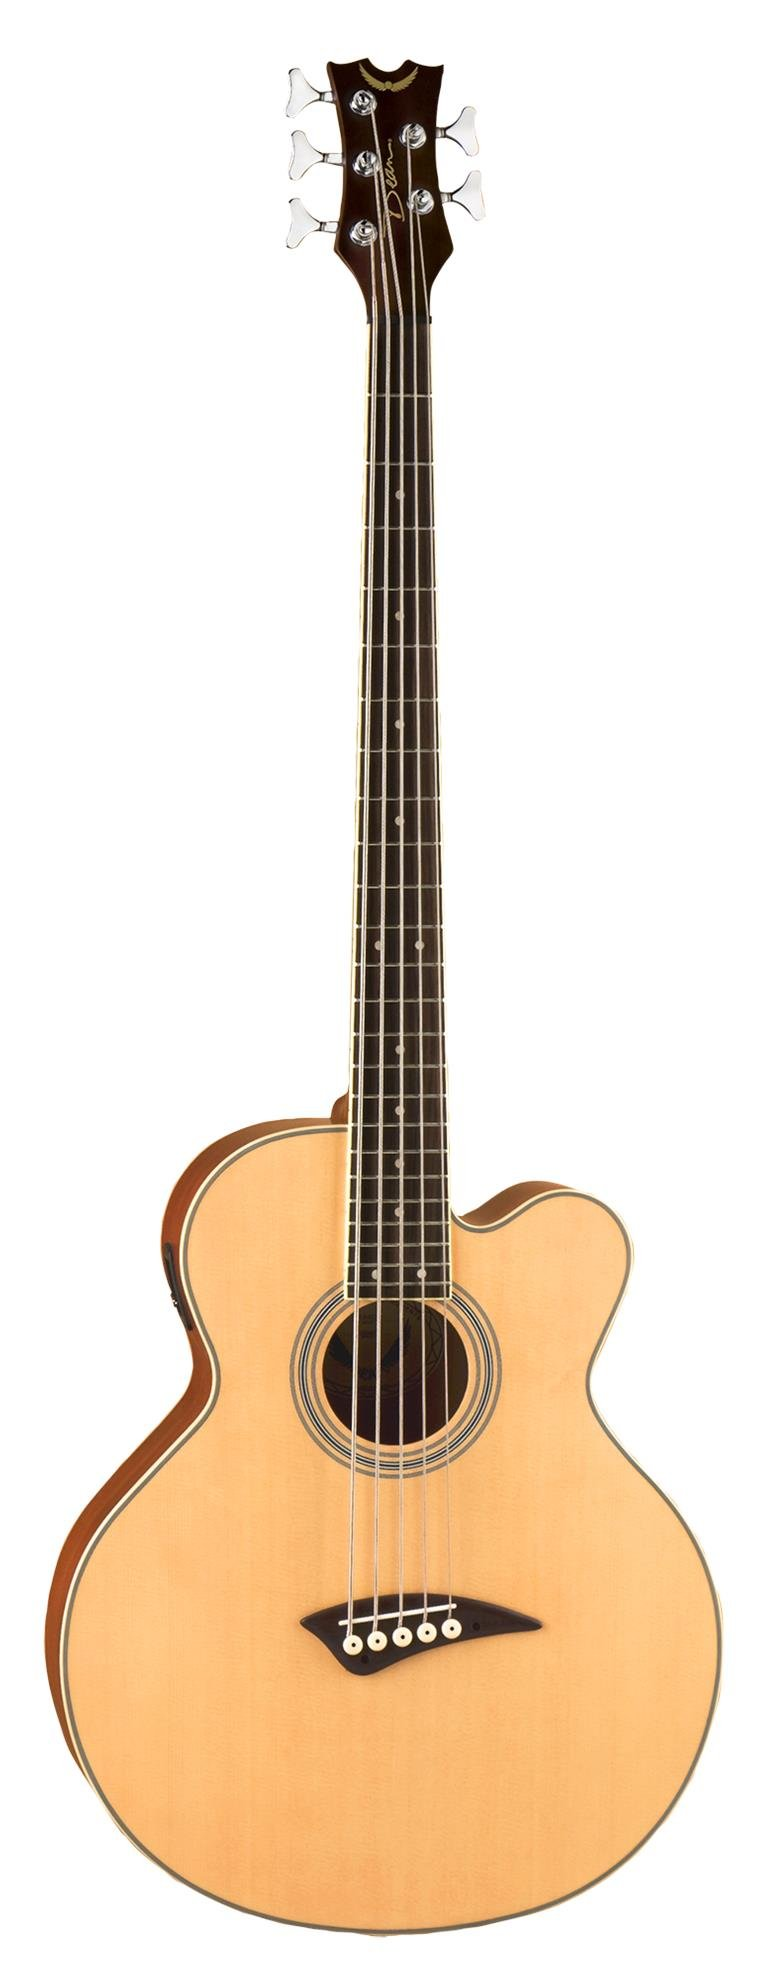 Dean A/E Bass Cutaway 5 String Satin Finish with Case, EABC5 CASE by Dean Guitars (Image #2)